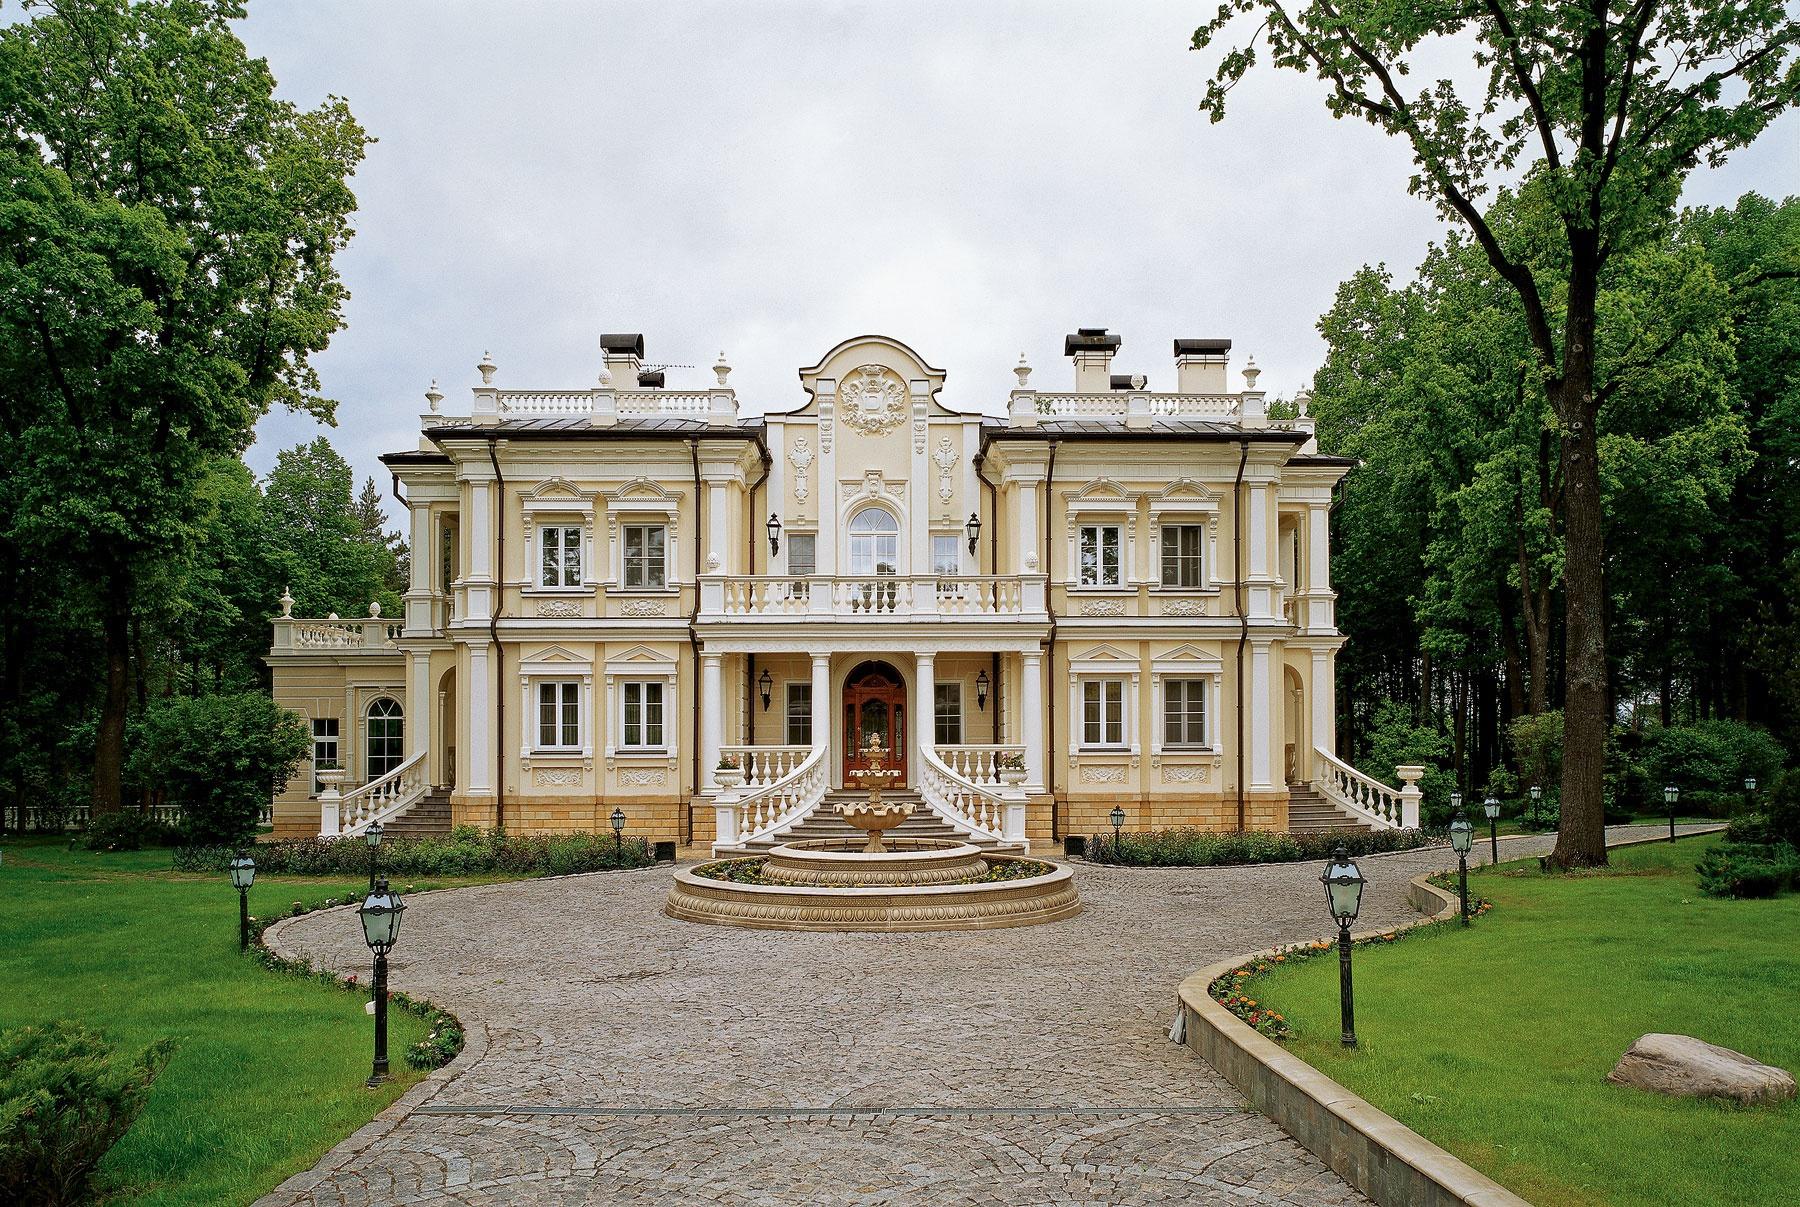 Бежево-белый фасад дома в классическом стиле